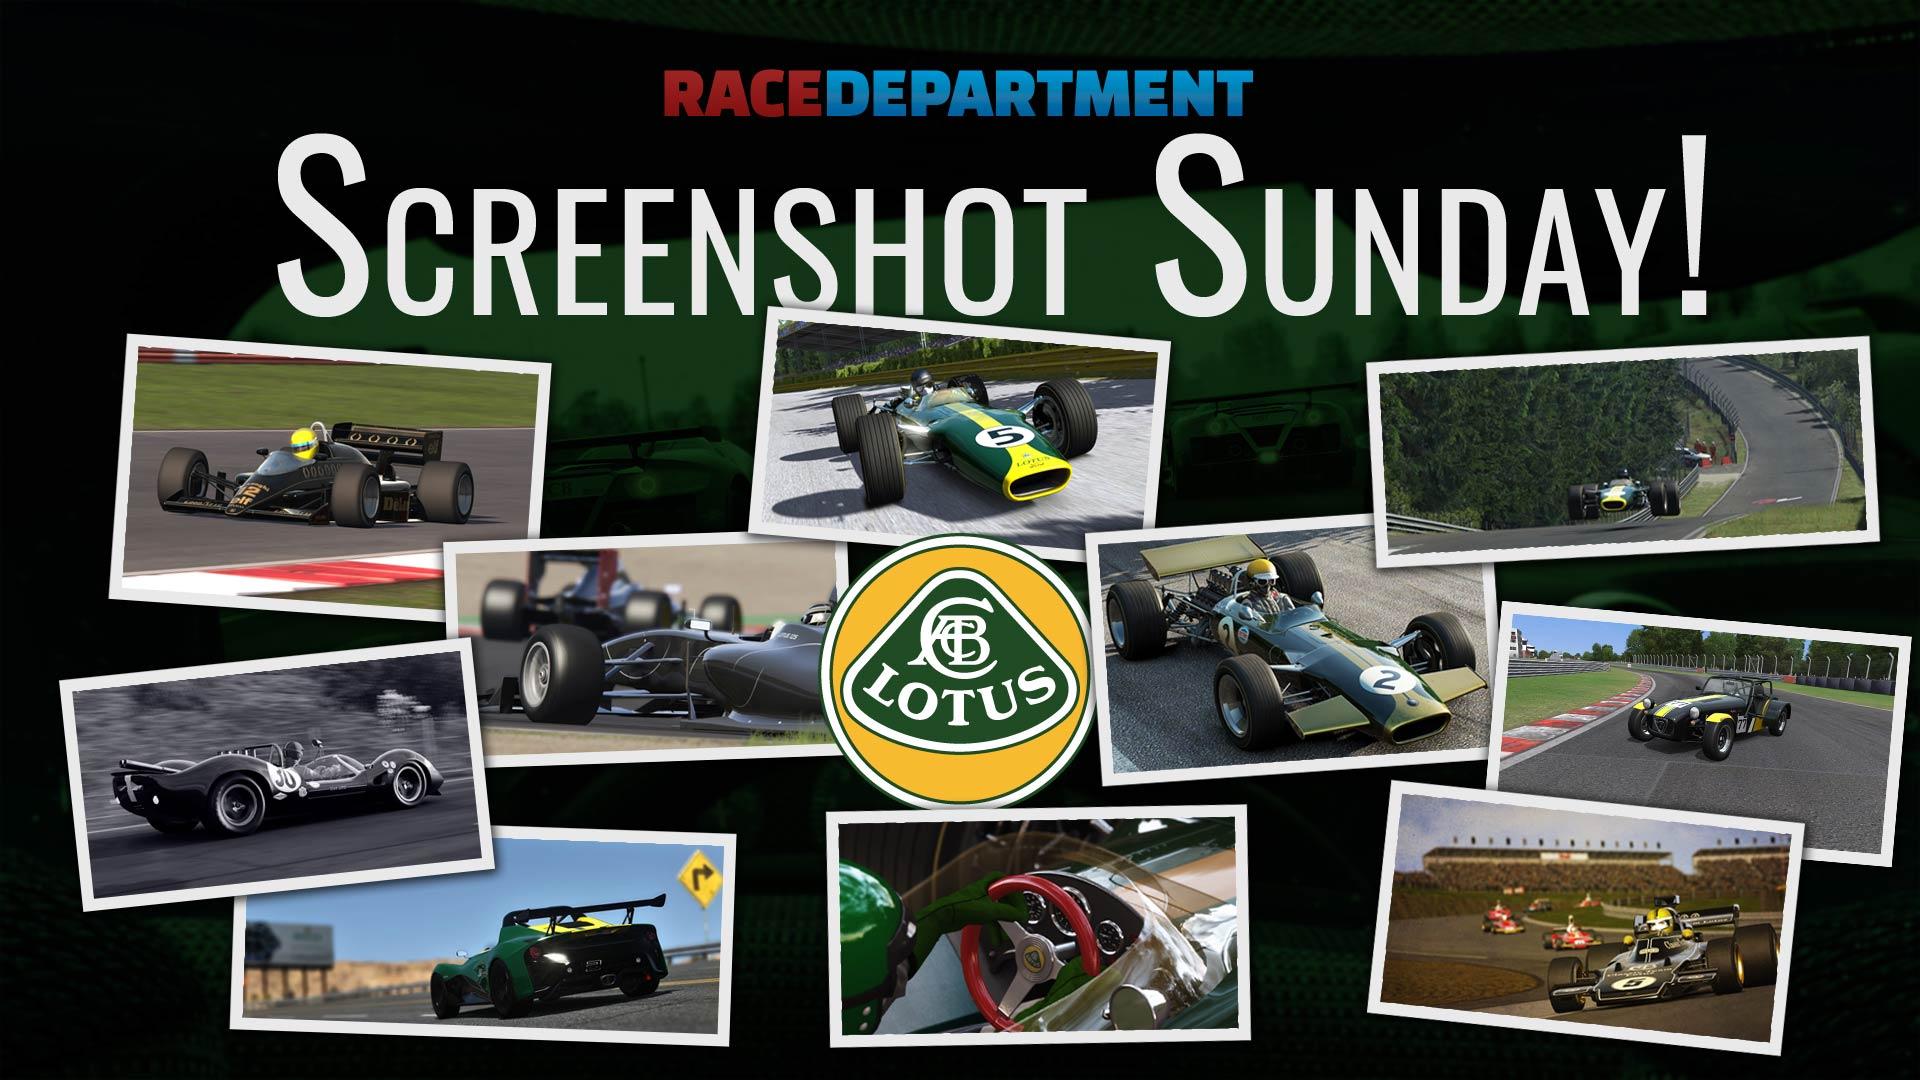 Screenshot Sunday - Lotus.jpg